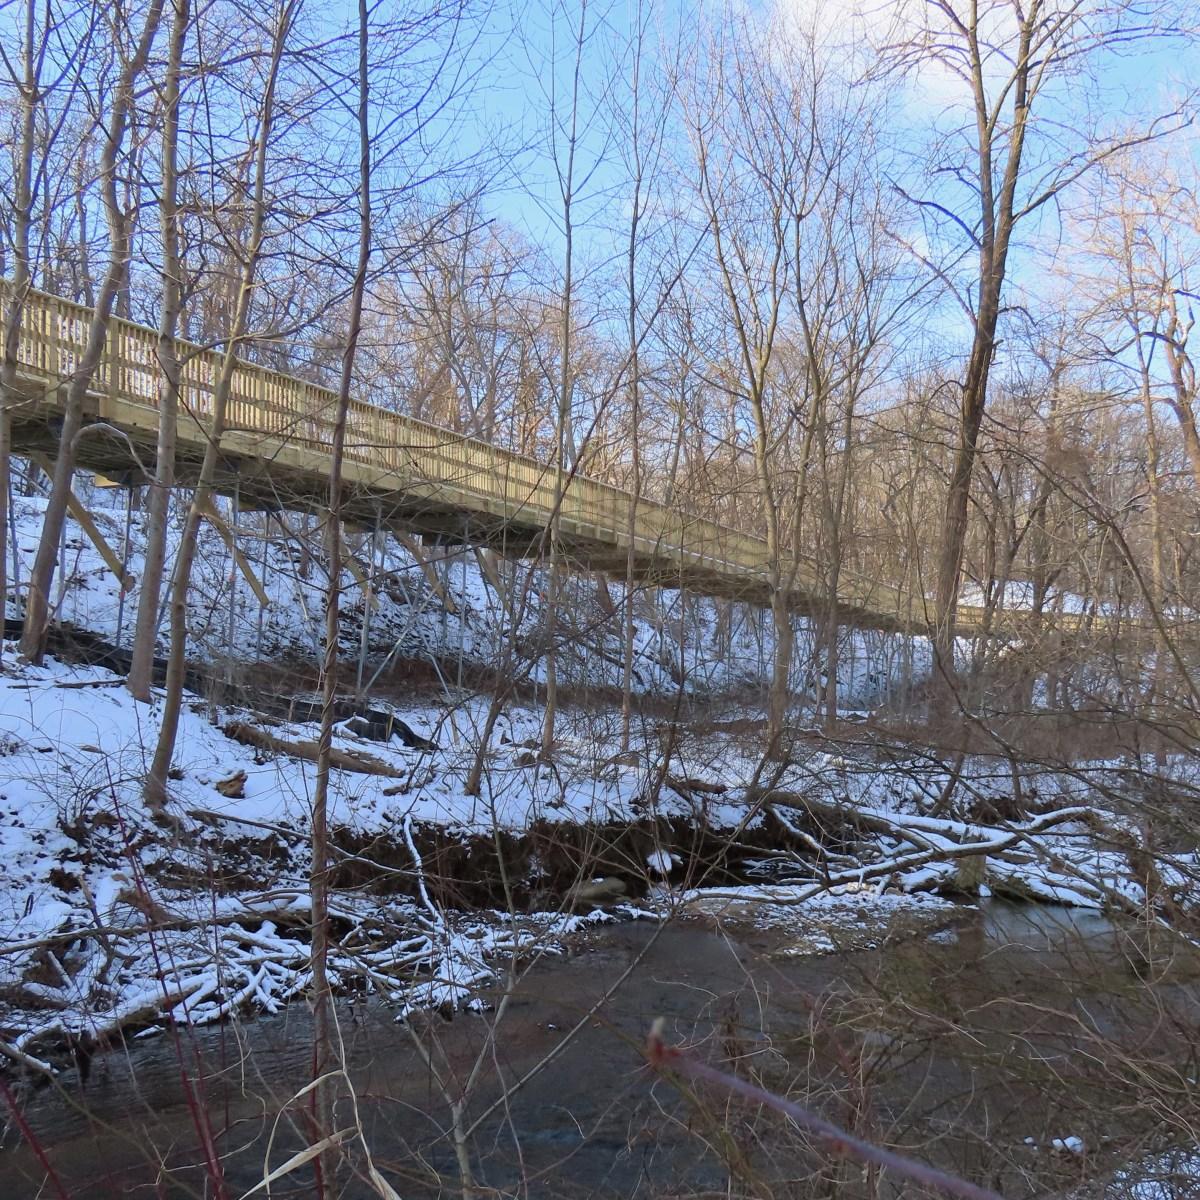 A wooden boardwalk captured from the creek below